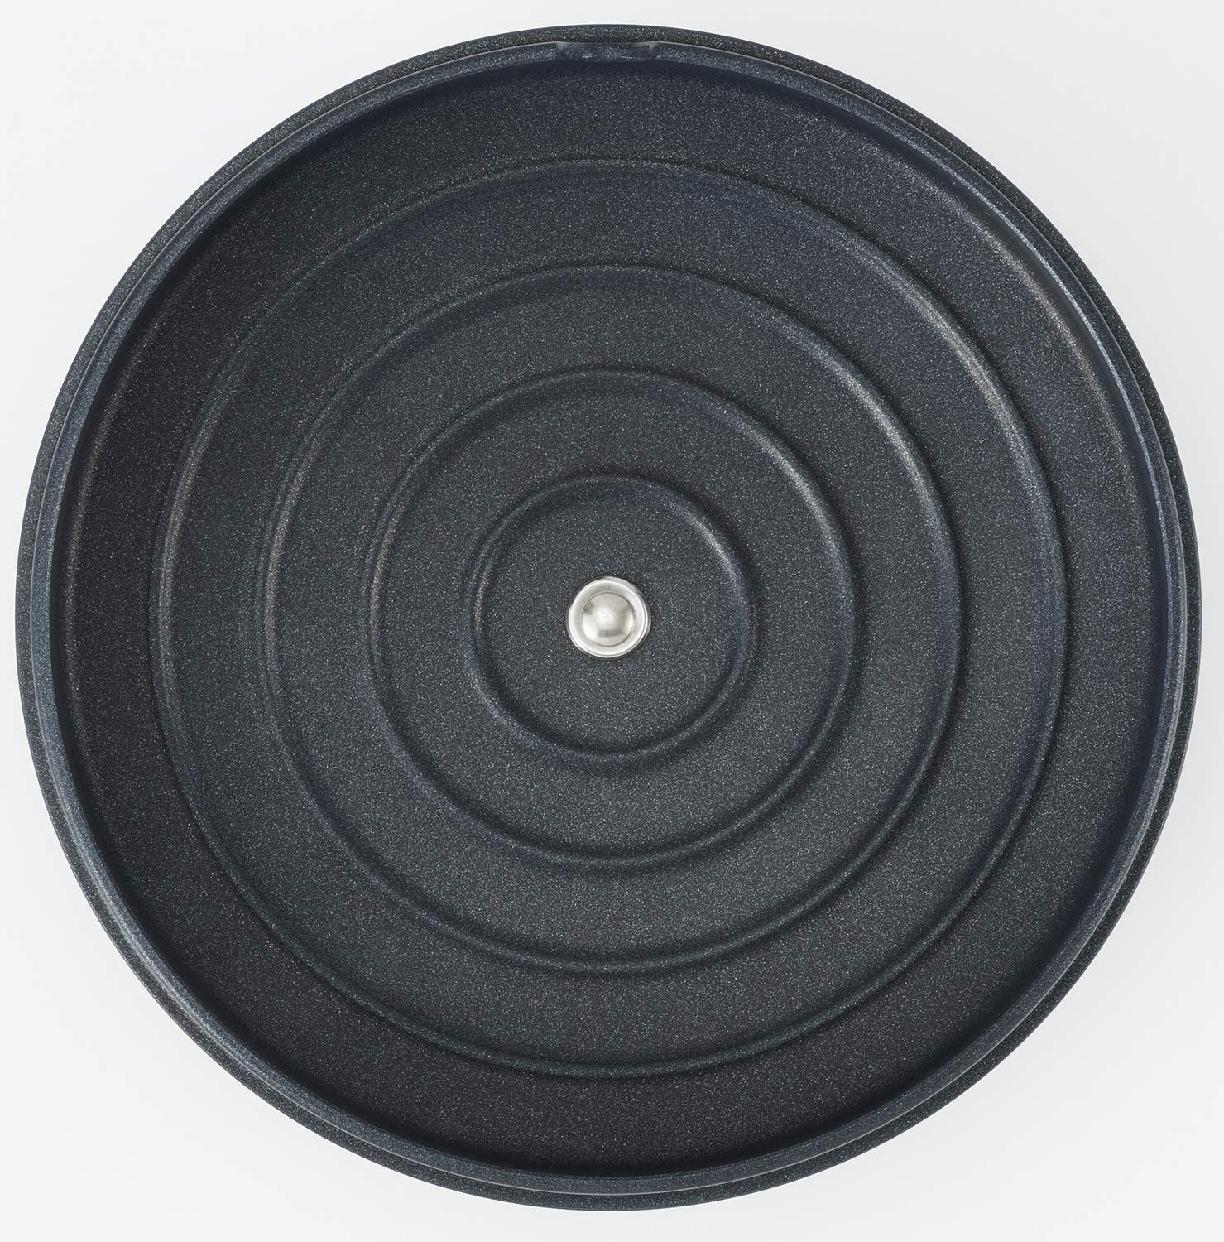 YOSHIKAWA(ヨシカワ) 栗原はるみ うまみ鍋 ネイビー 22cm HK11636の商品画像6